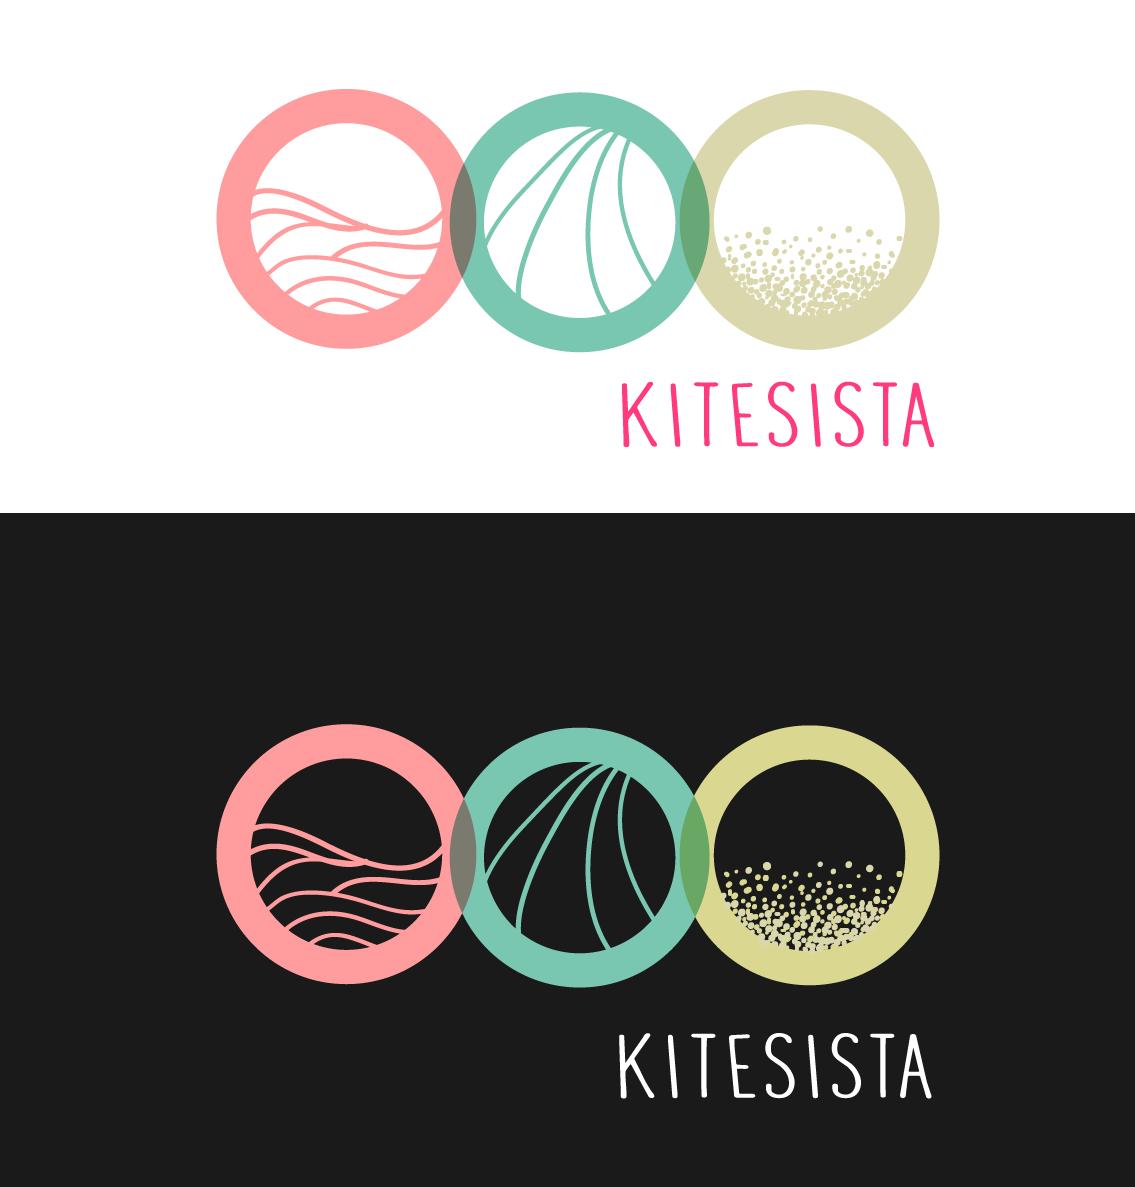 iconic logo for leading girls online kitesurf and beach lifestyle